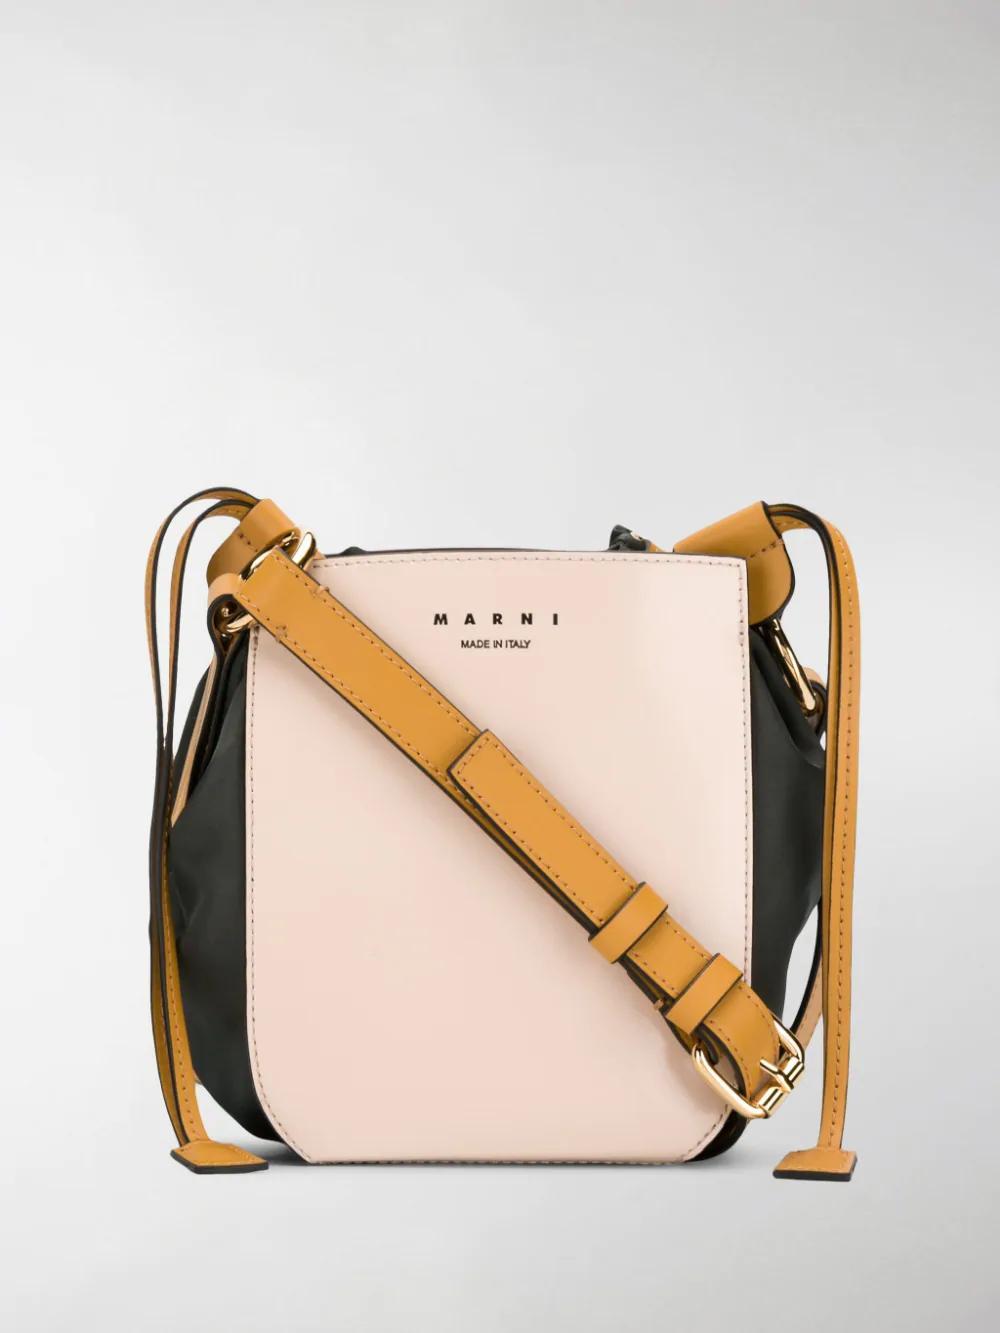 Stefania Mode product